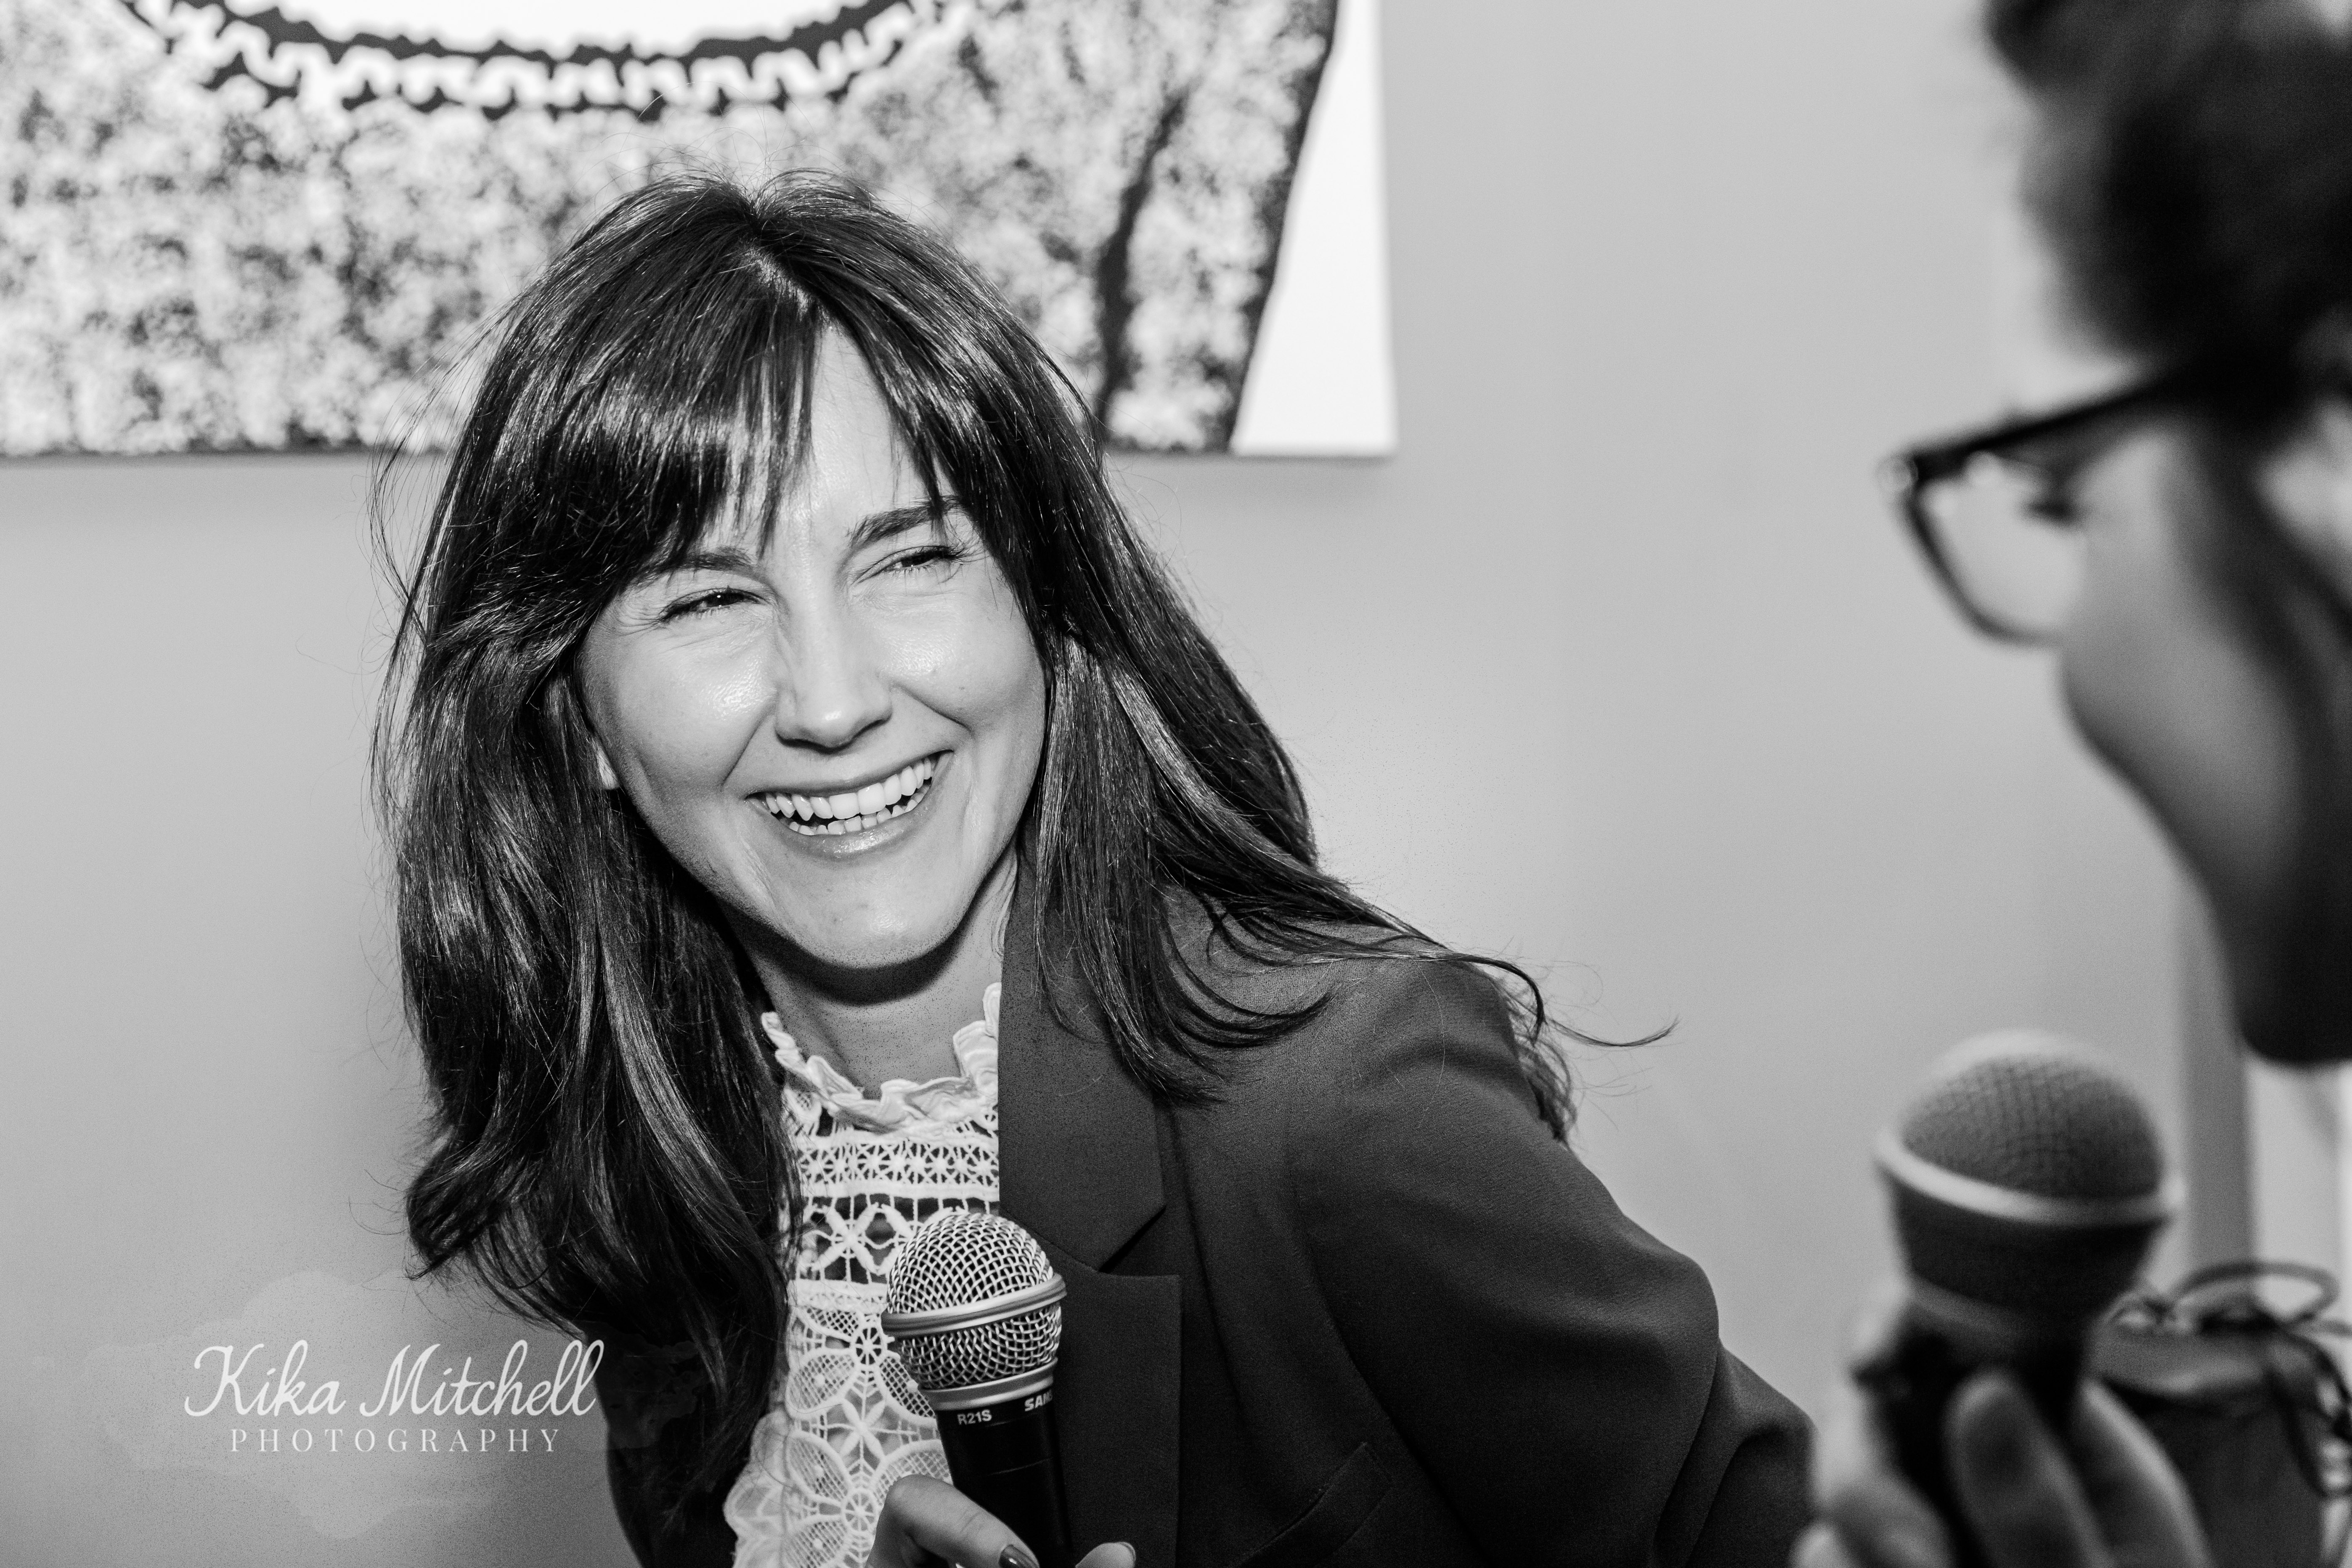 Natasha Sawkins Mother Hun co founder by Kika Mitchell Photography Chelmsford Photographer